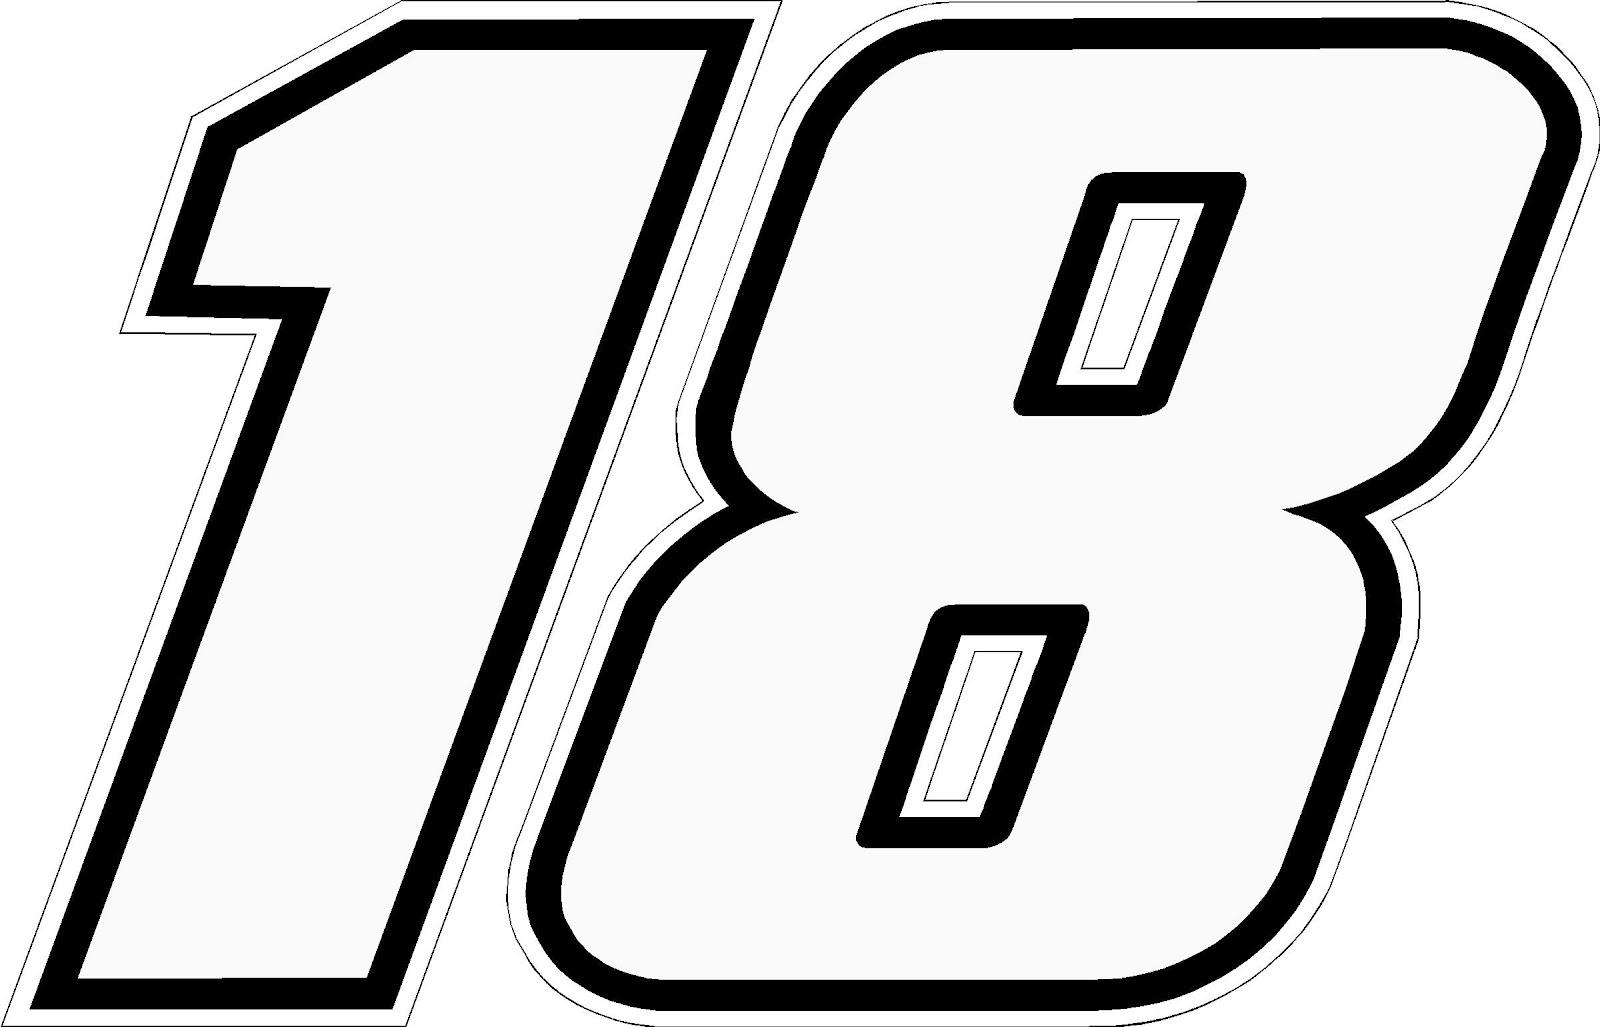 Gibbs Garage Logano Bounces Back To 4th Place Finish At